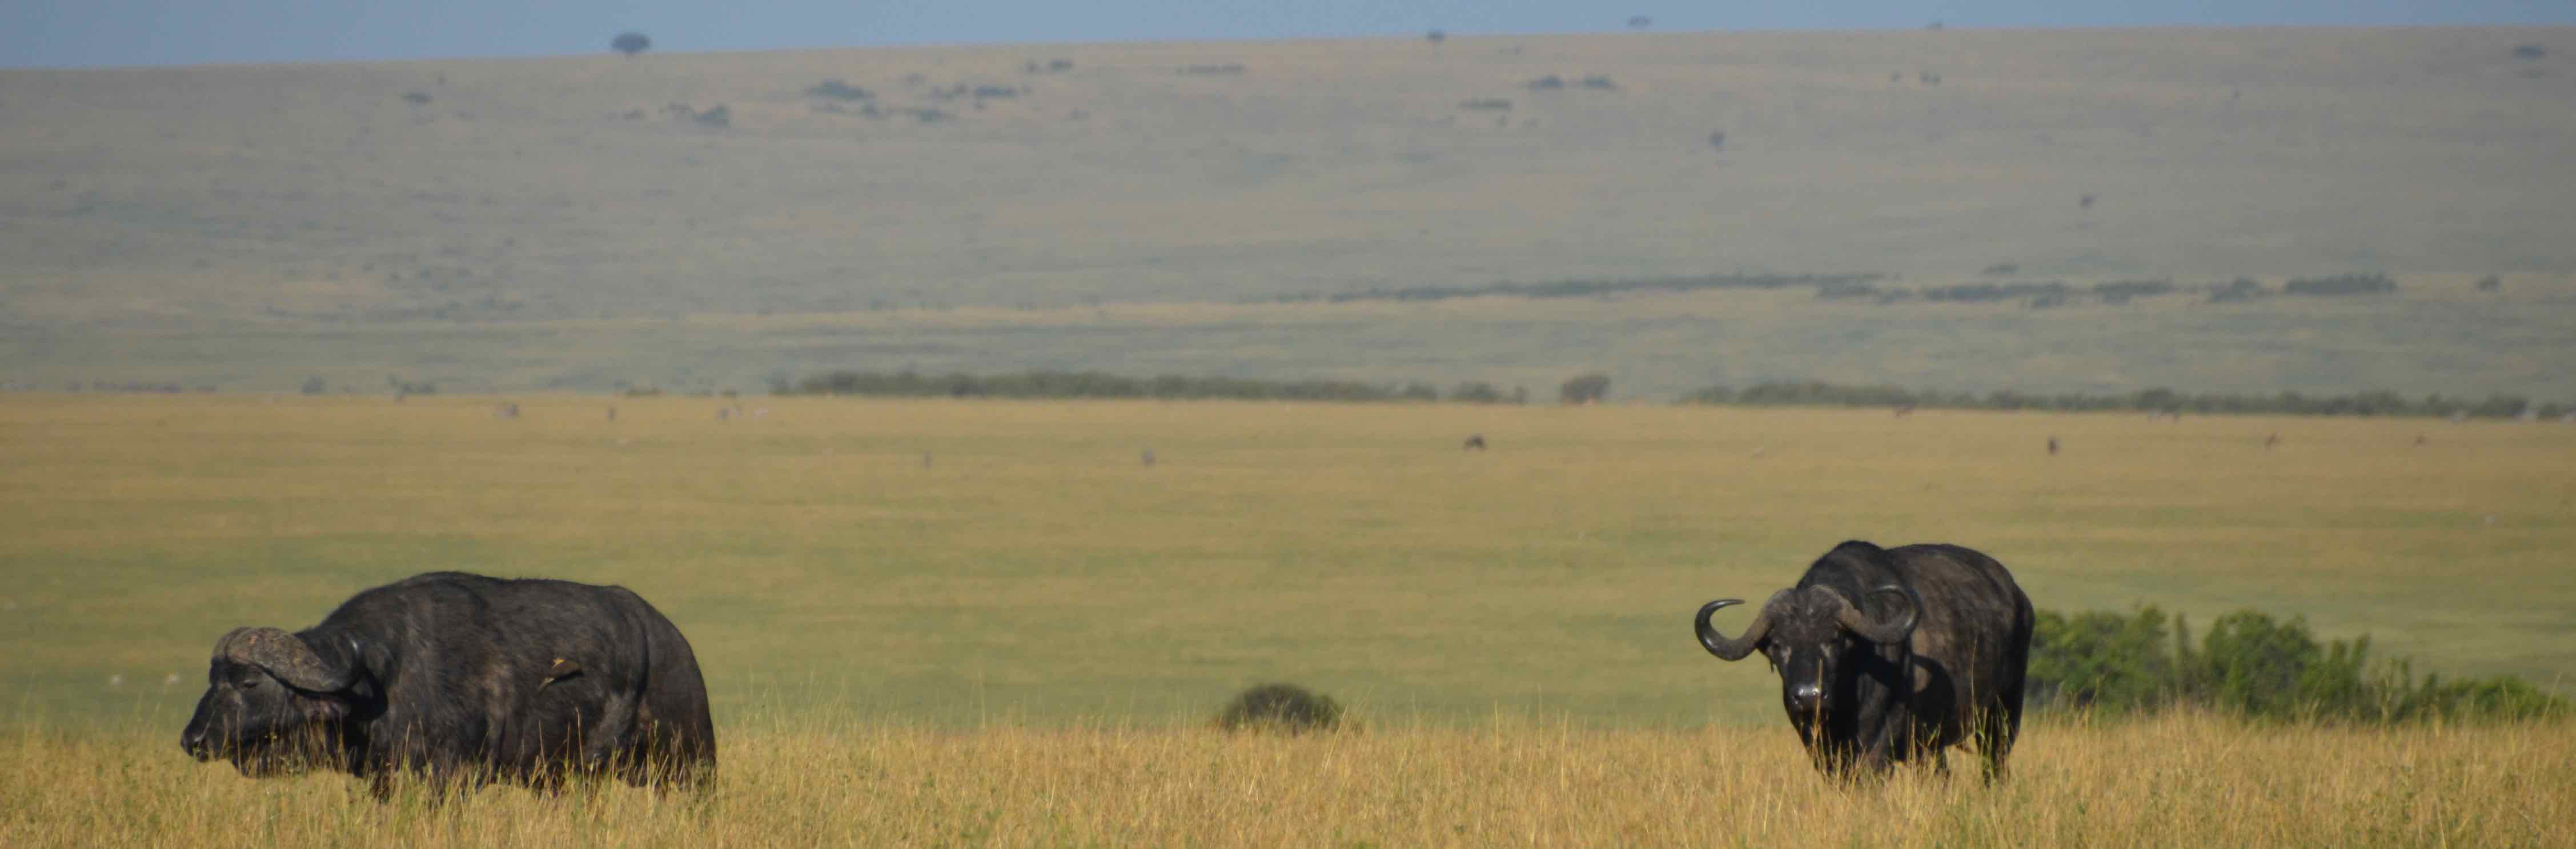 Two African Cape Buffalo on the savanna grasslands of Maasai land, Tanzania community conservation.